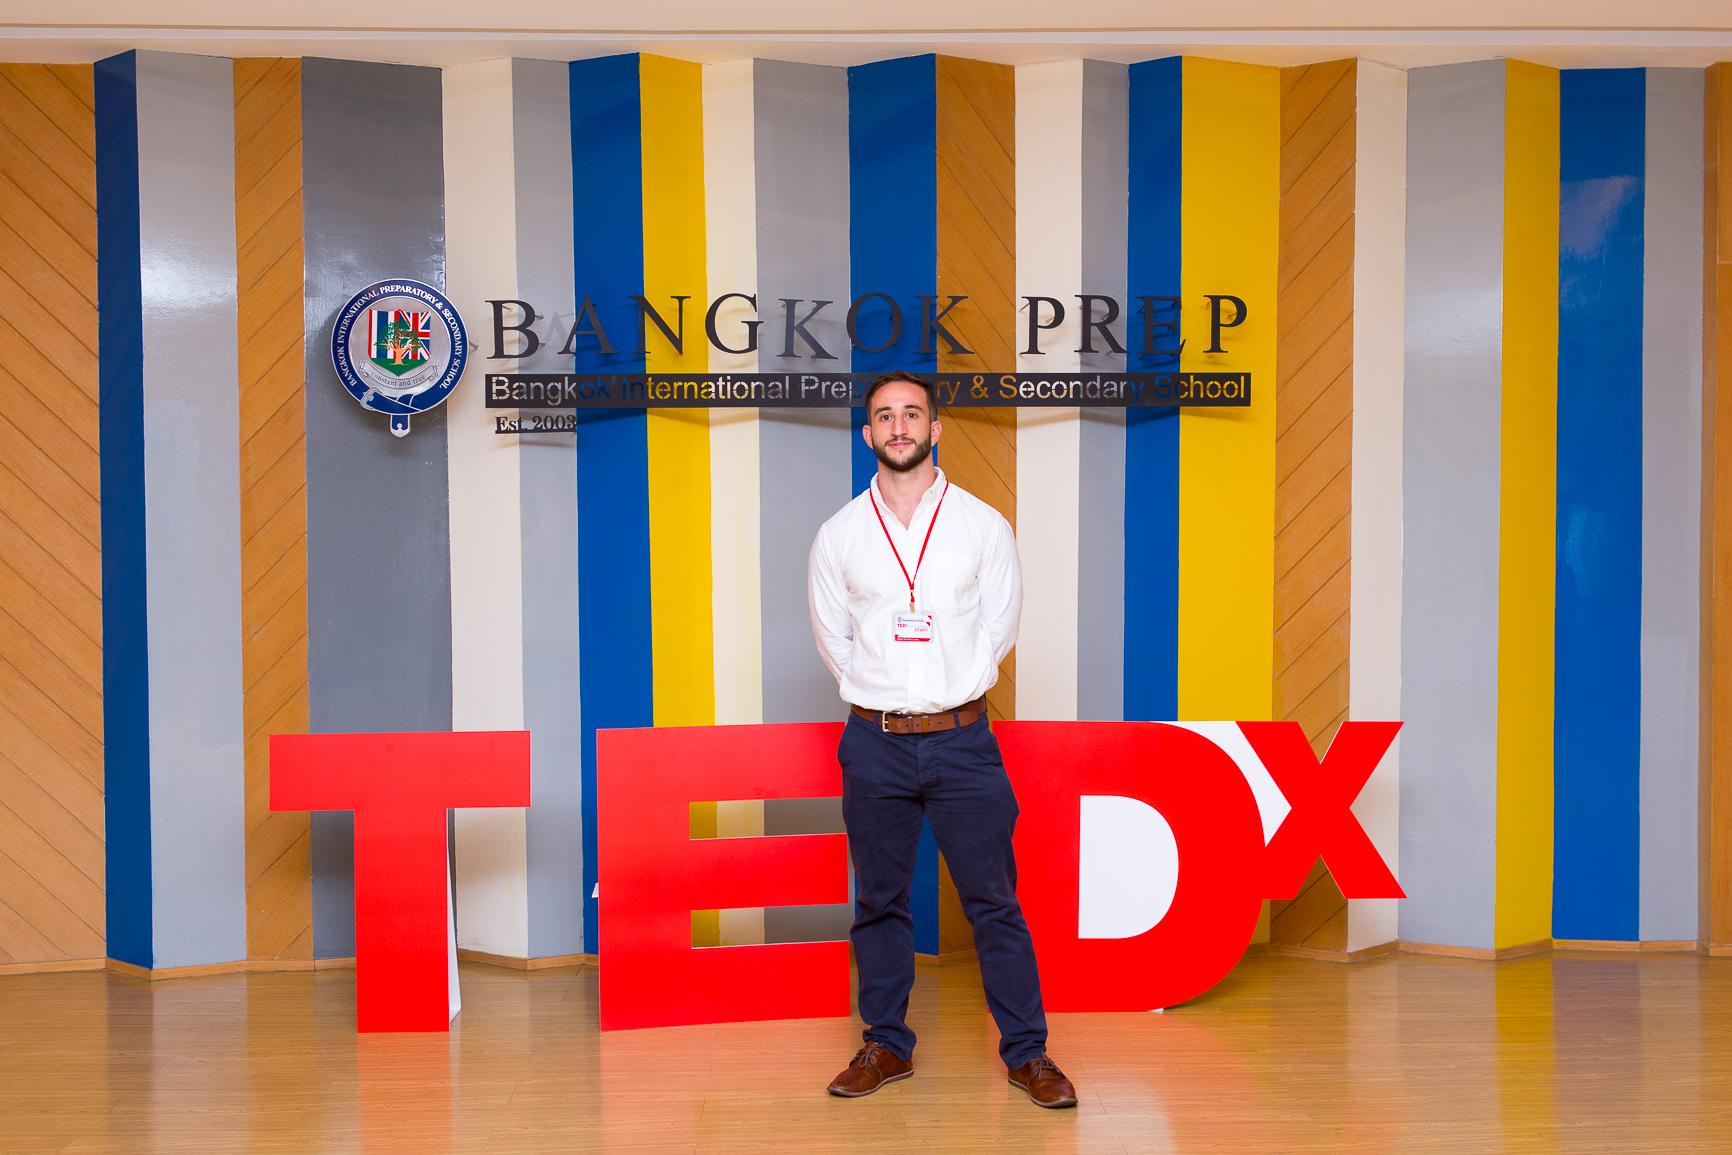 TED talk-24